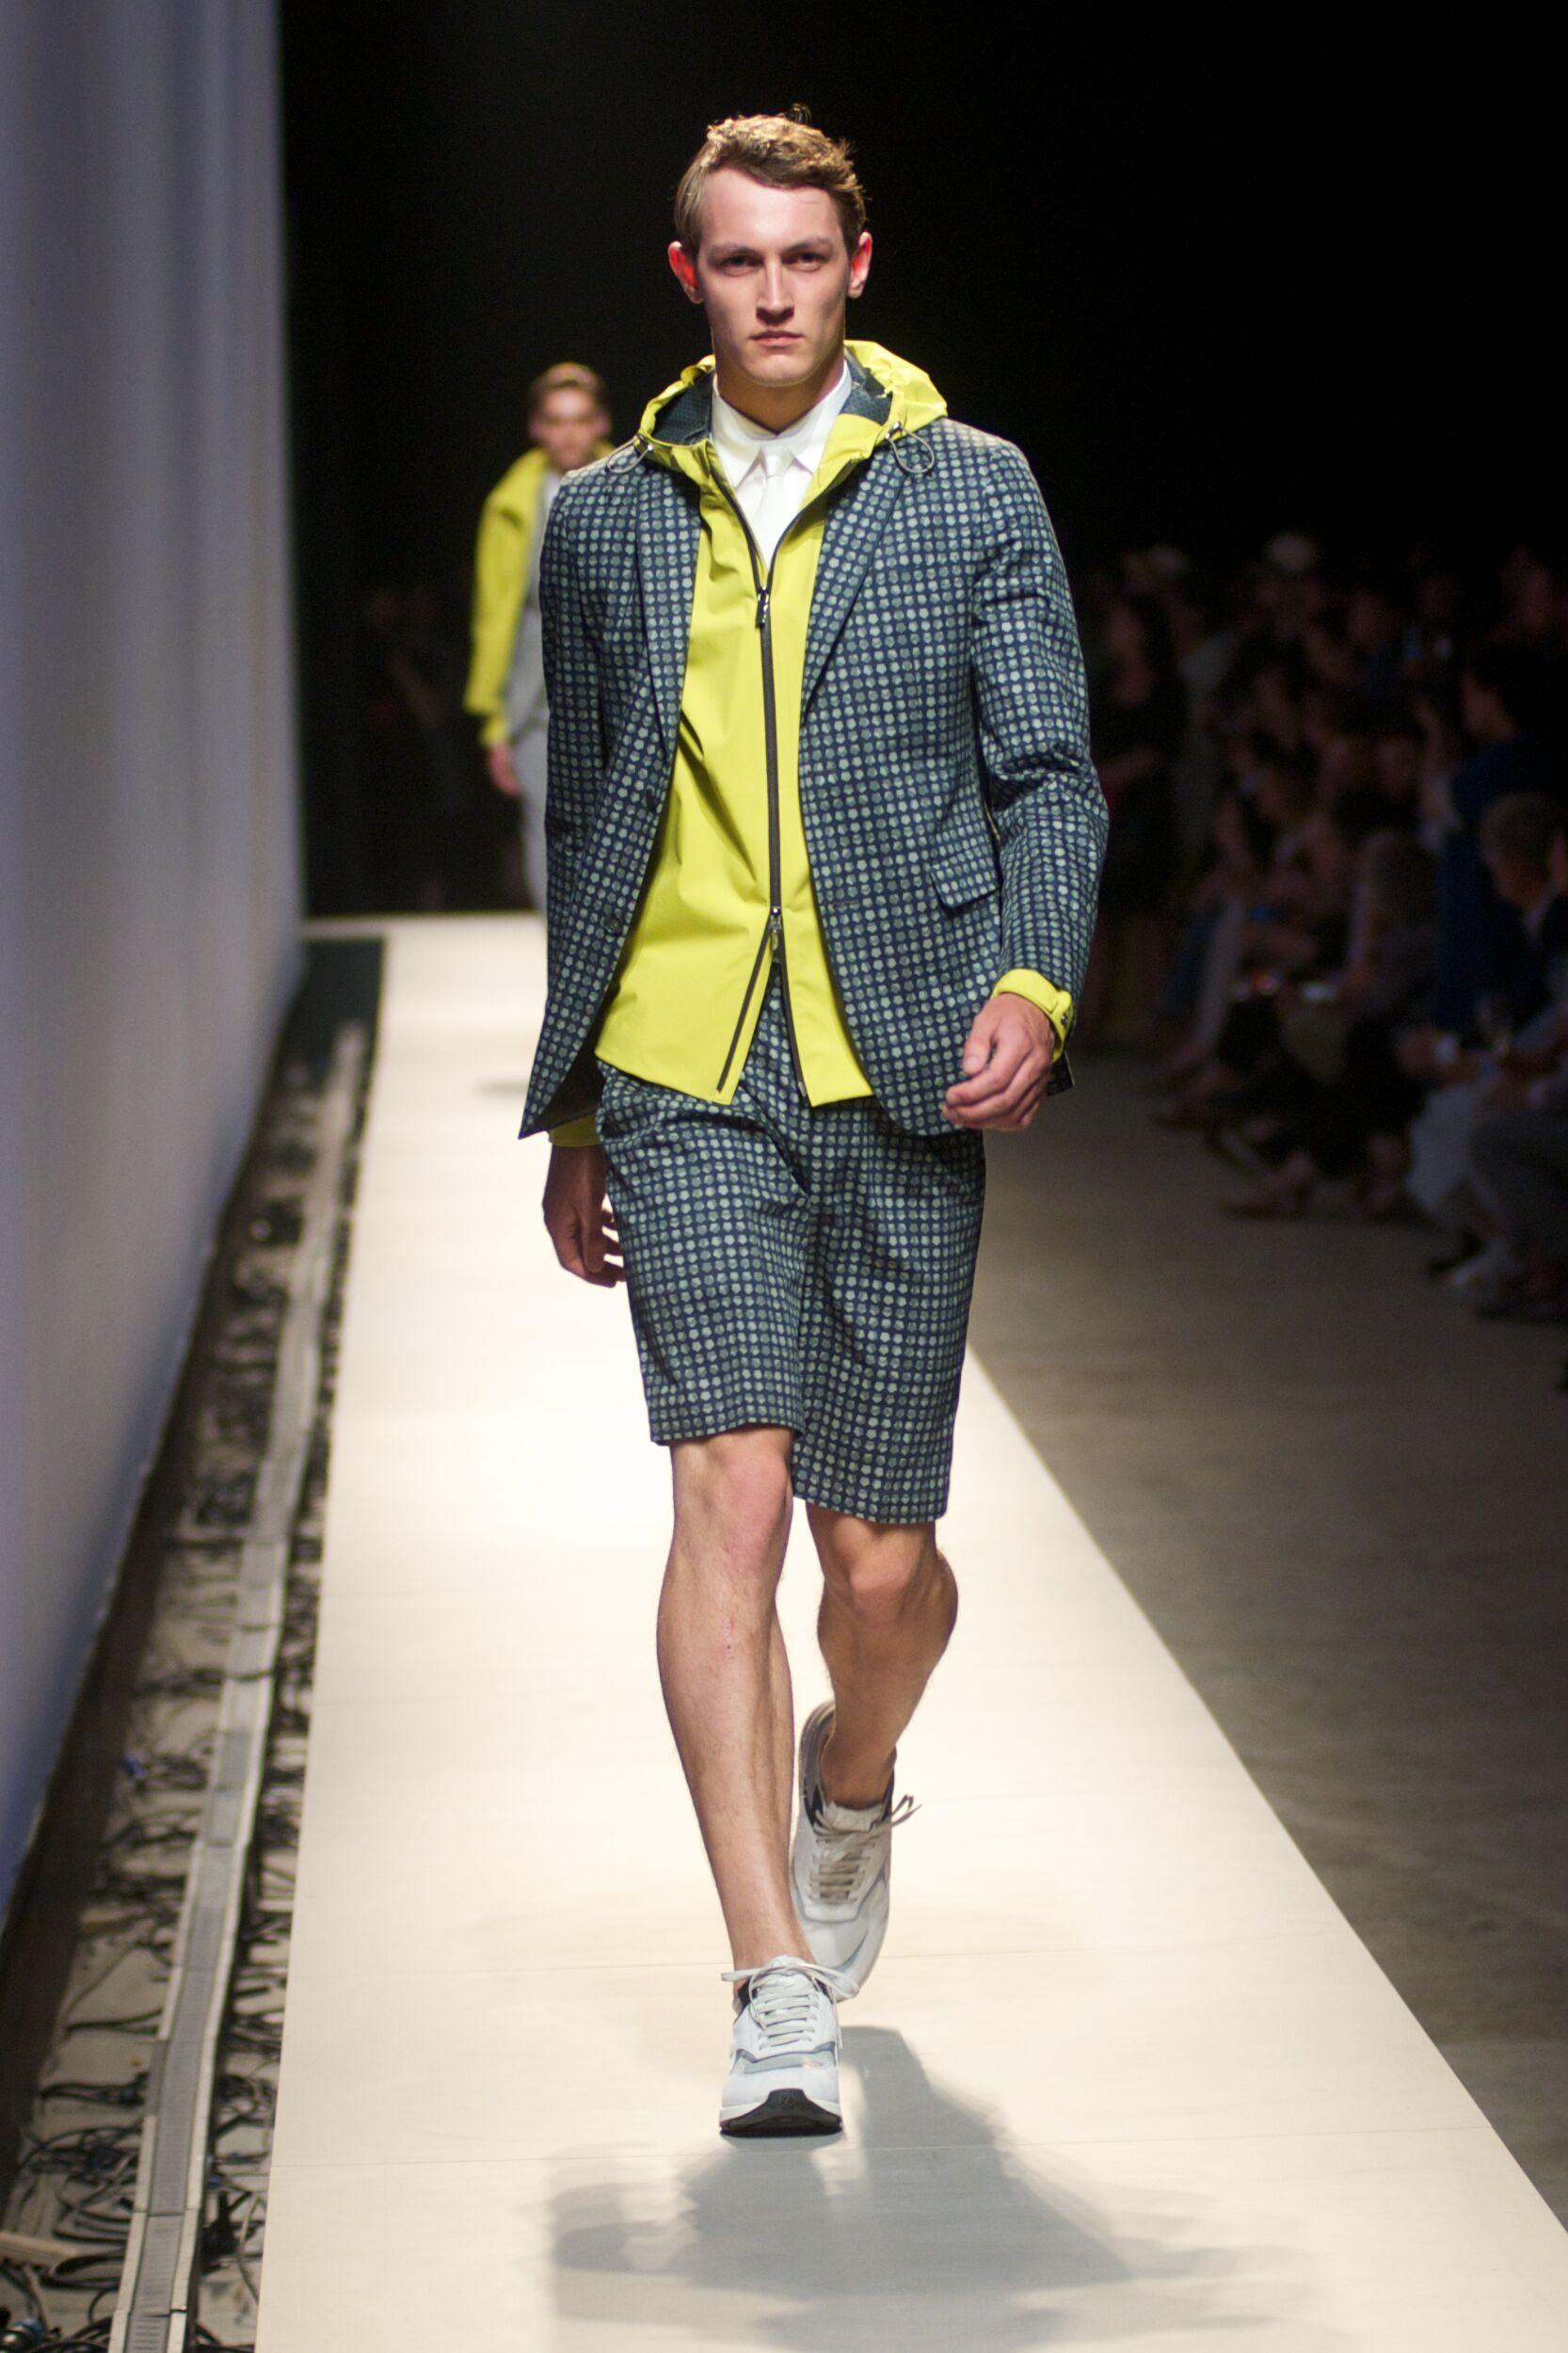 Catwalk Z Zegna Man Fashion Show Summer 2015